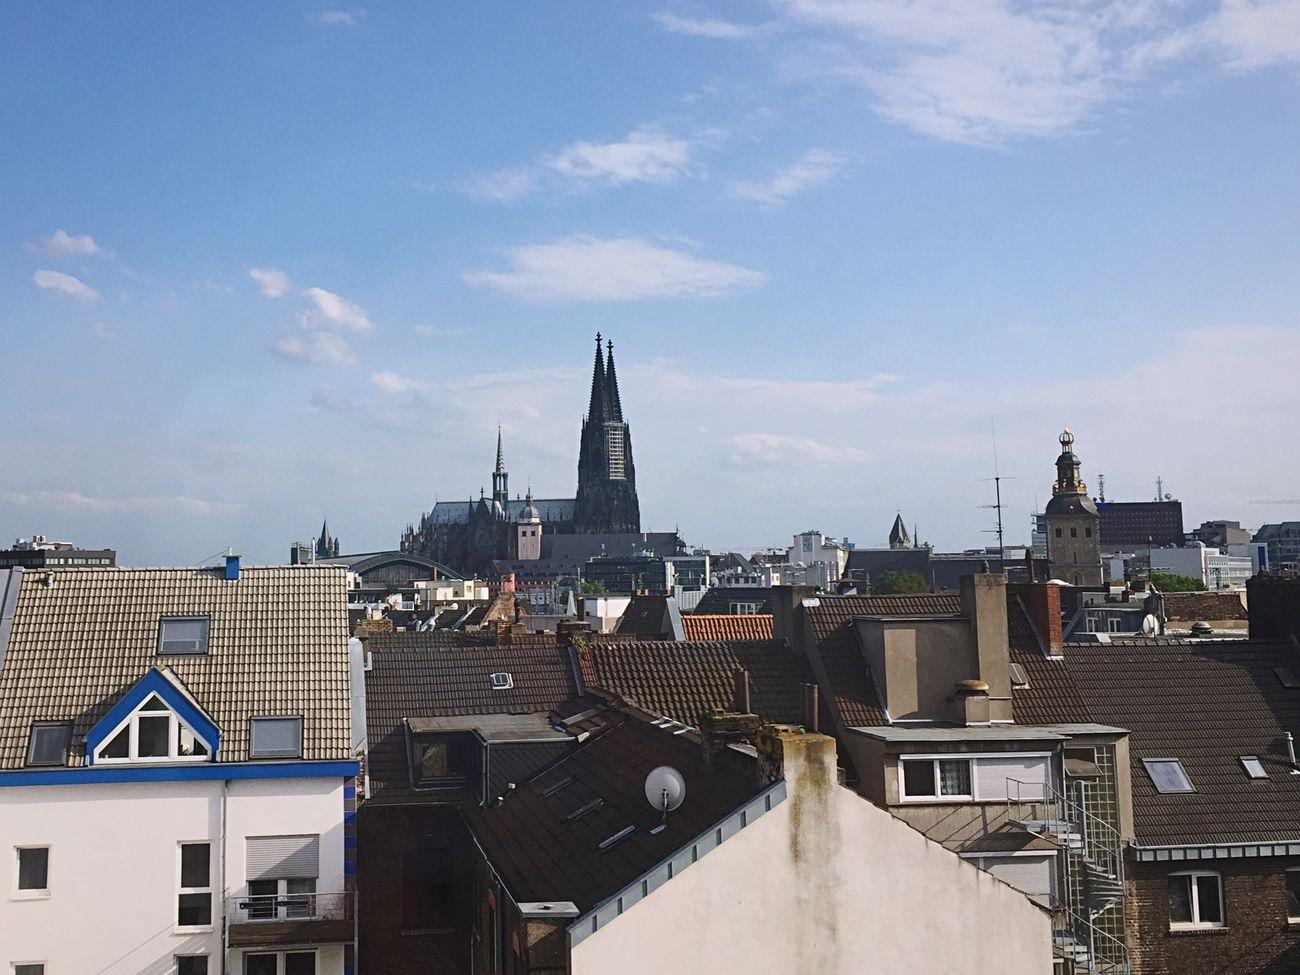 Kölner Dom Cologne Köln Liebedeindstadt Architecture Hinterhof Urbanism Urban (null)Sky Roof City Cloud - Sky Outdoors Day Cityscape Skyline ♥